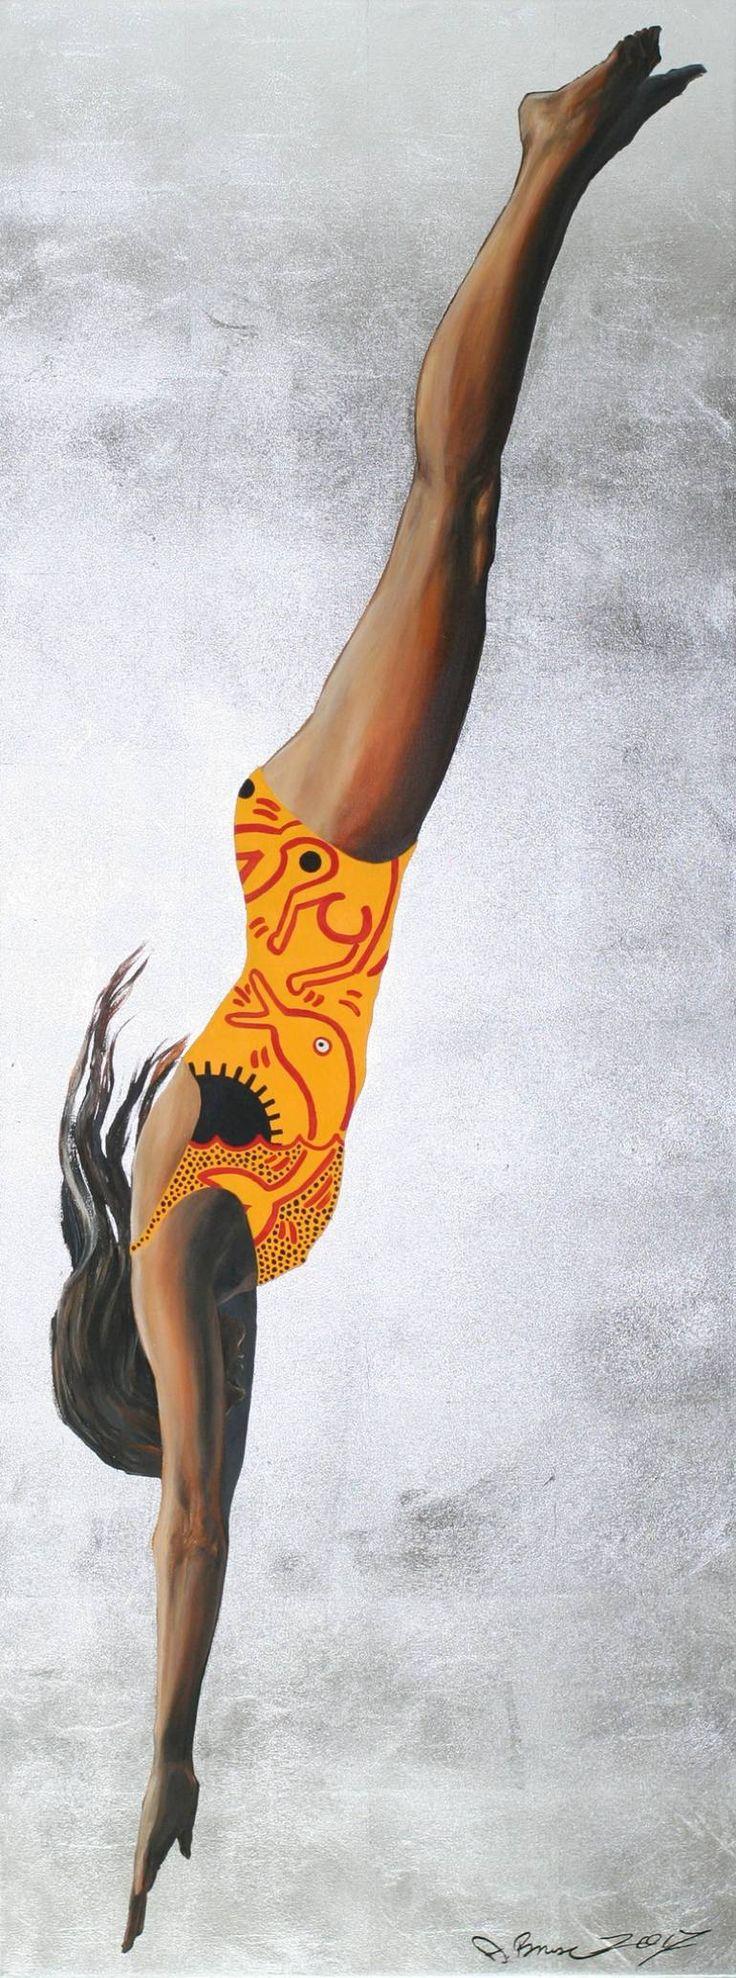 "Saatchi Art Artist Arno Bruse; Painting, ""The Art of Diving IX"" #art"